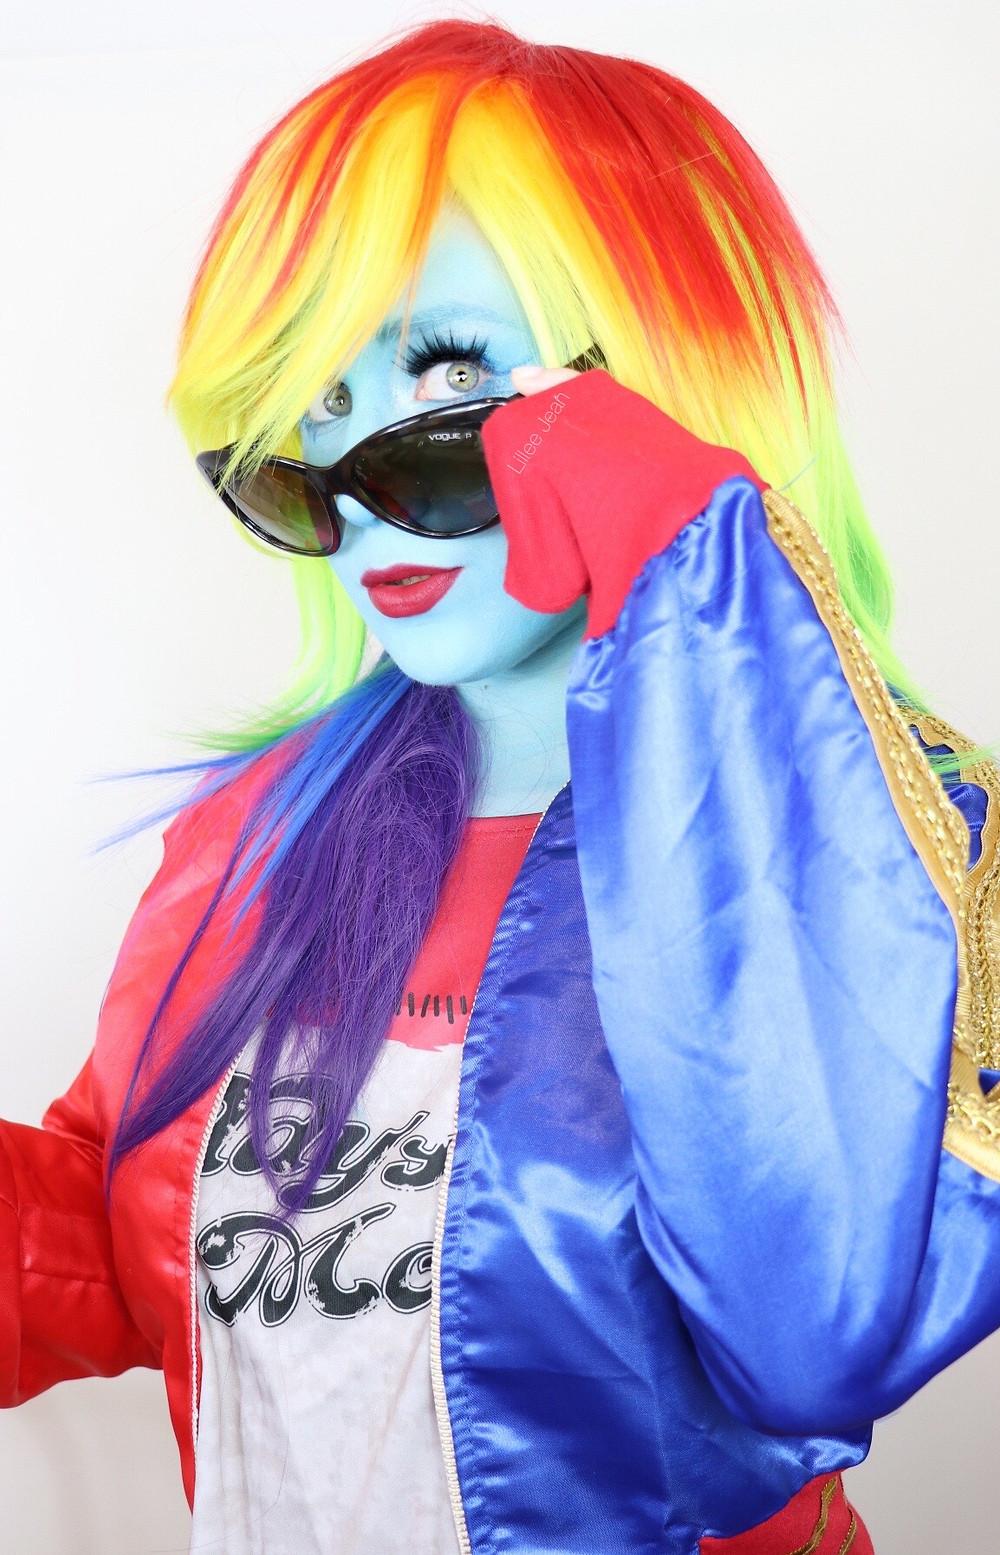 RAINBOW DASH My Little Pony Cosplay Makeup Tutorial 2020 | Equestria Girls | Lillee Jean